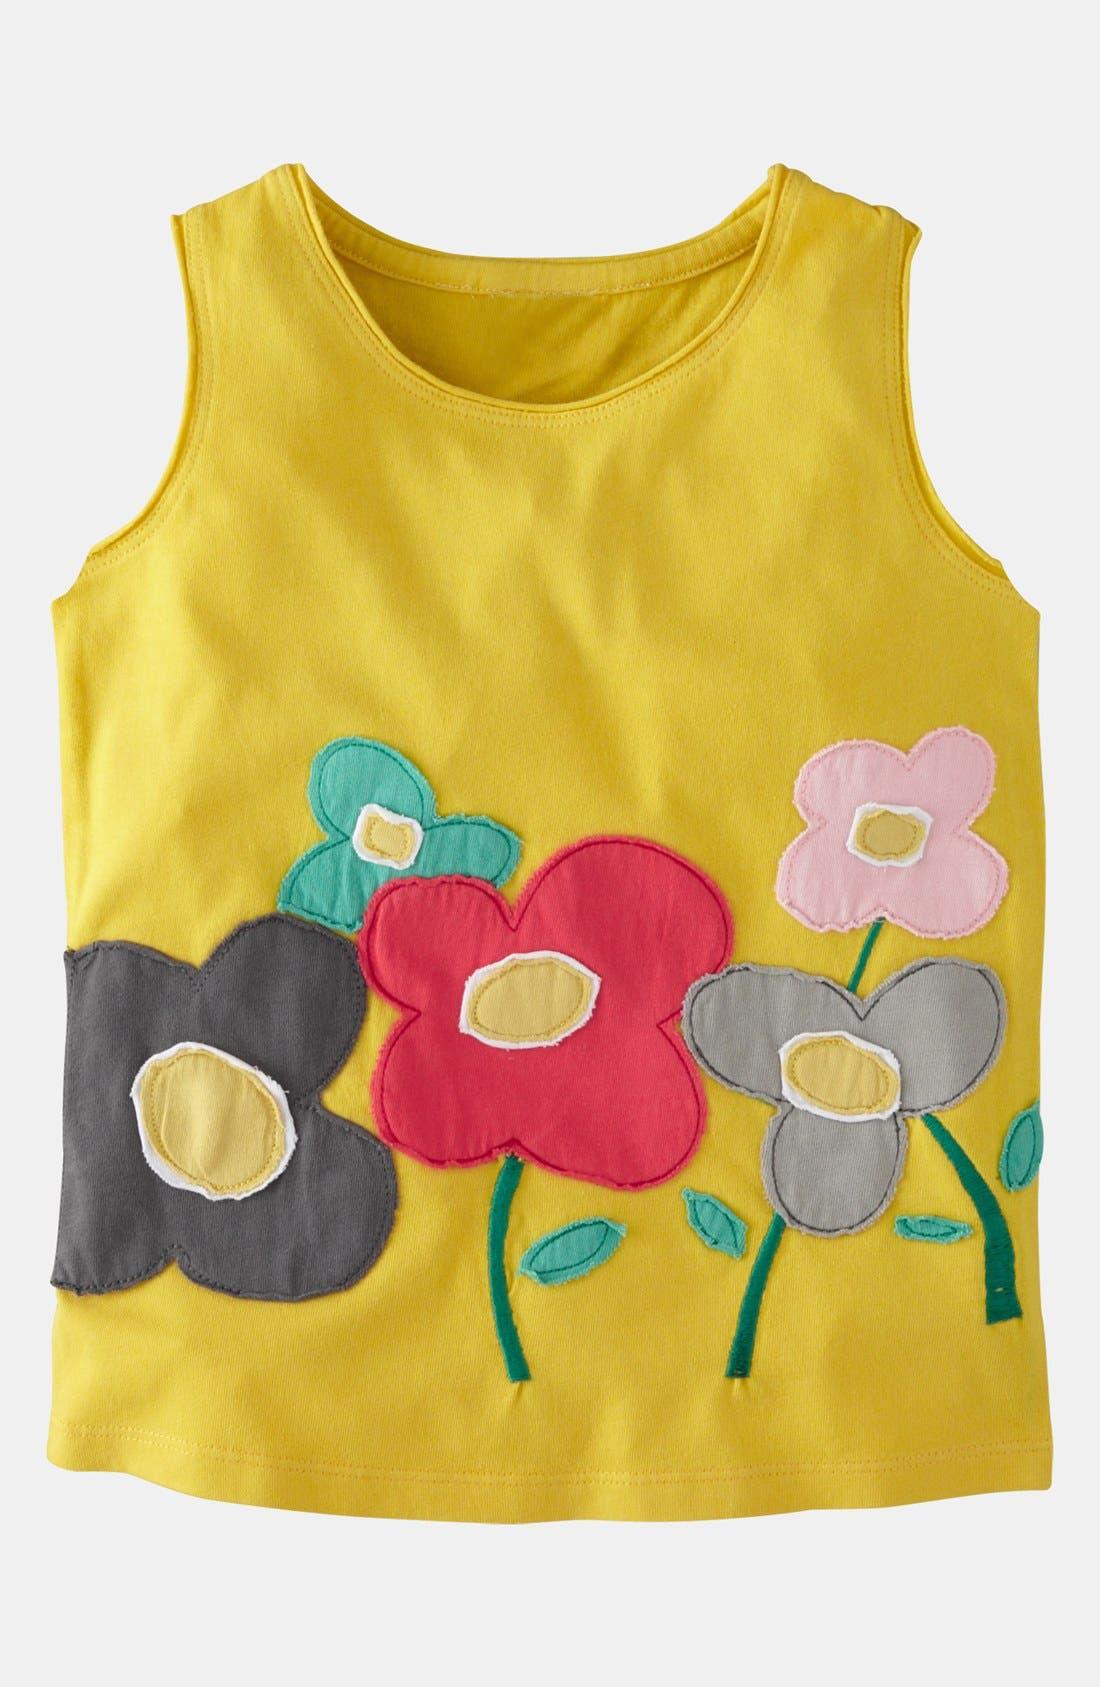 Main Image - Mini Boden 'Fab Flower' Tank Top (Toddler)